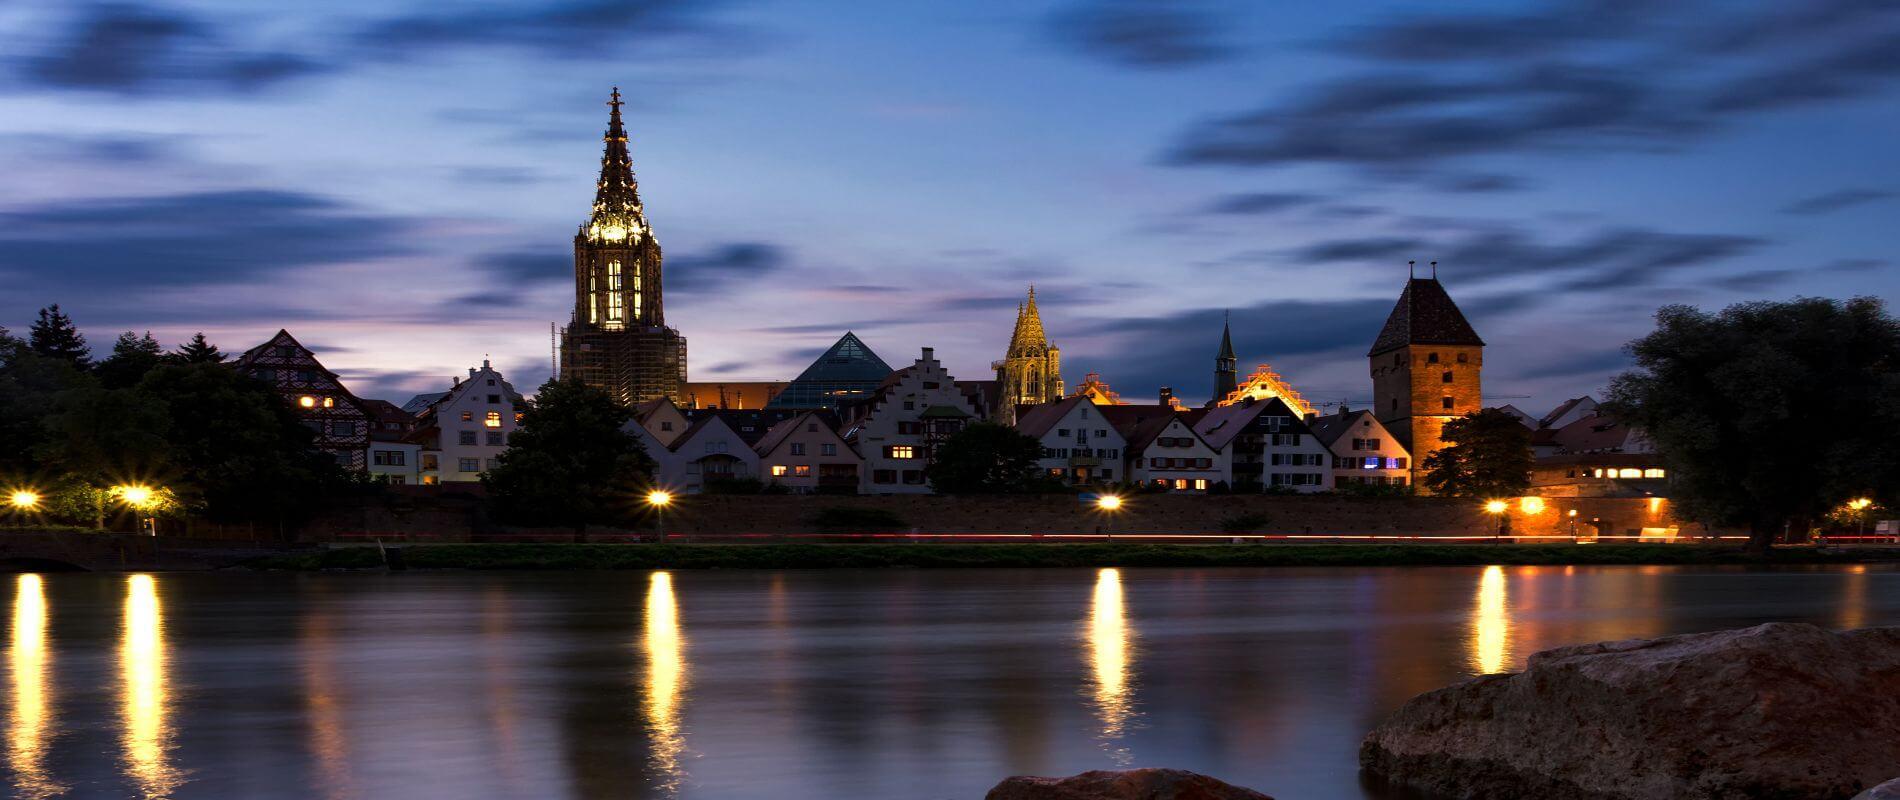 Smart City Ulm - Smart City Atlas Deutschland